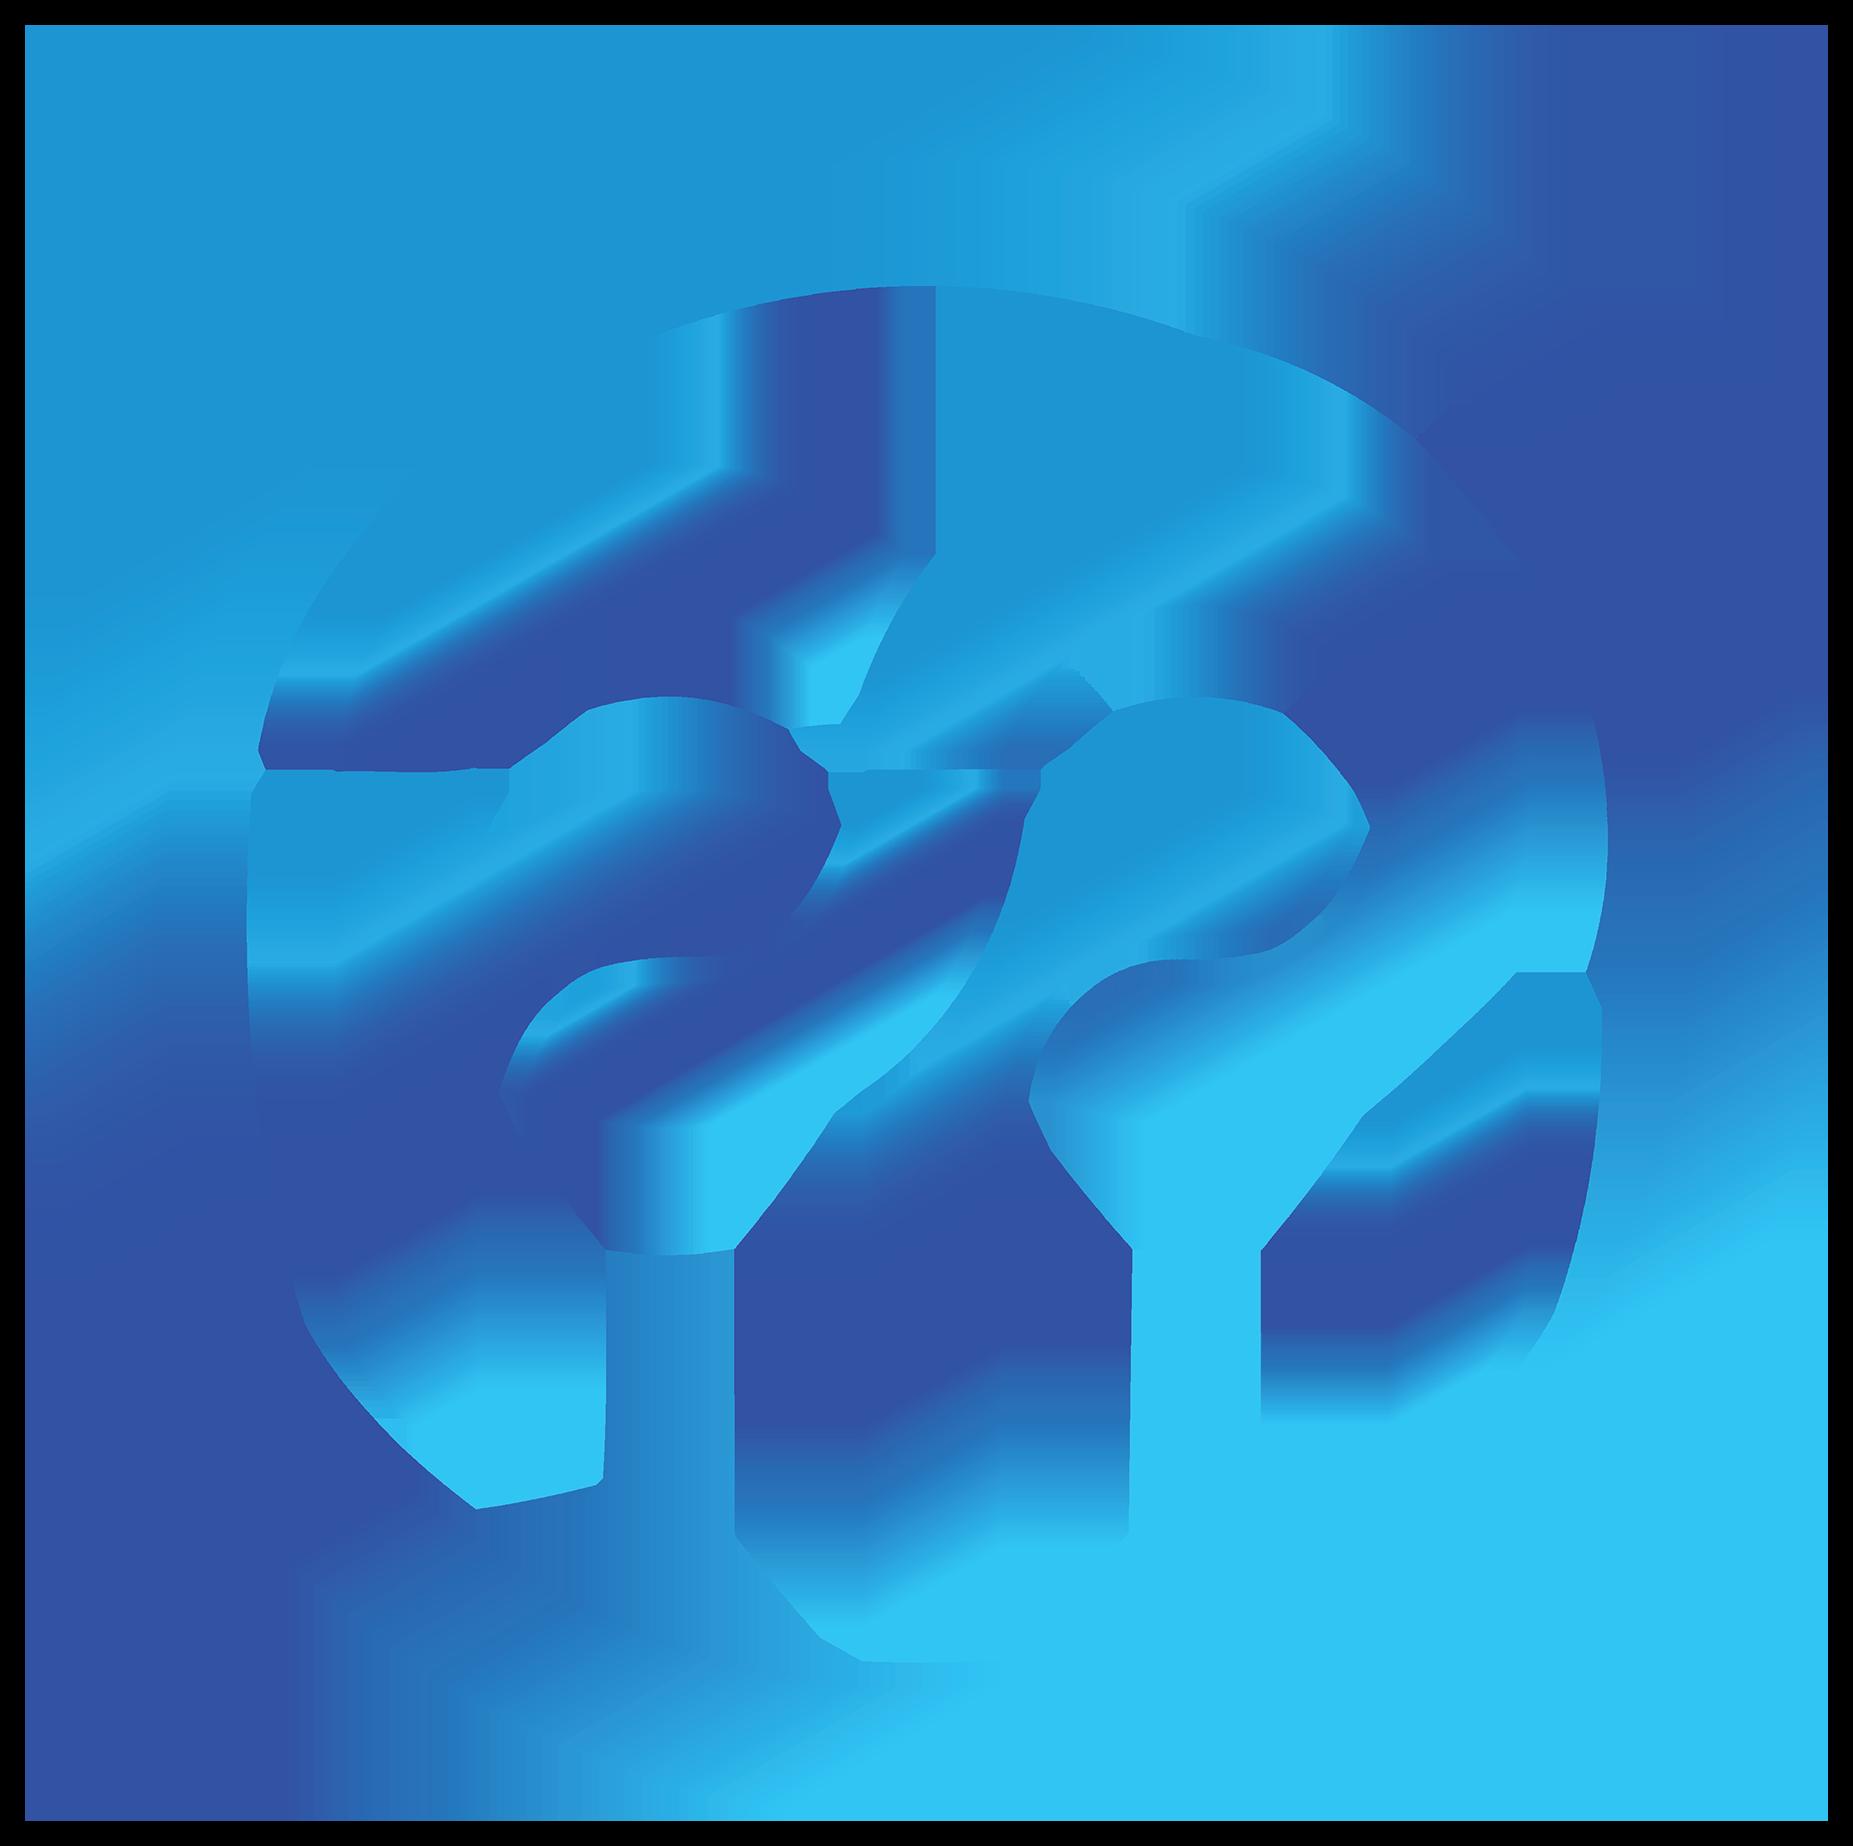 PierPoint Mortgage